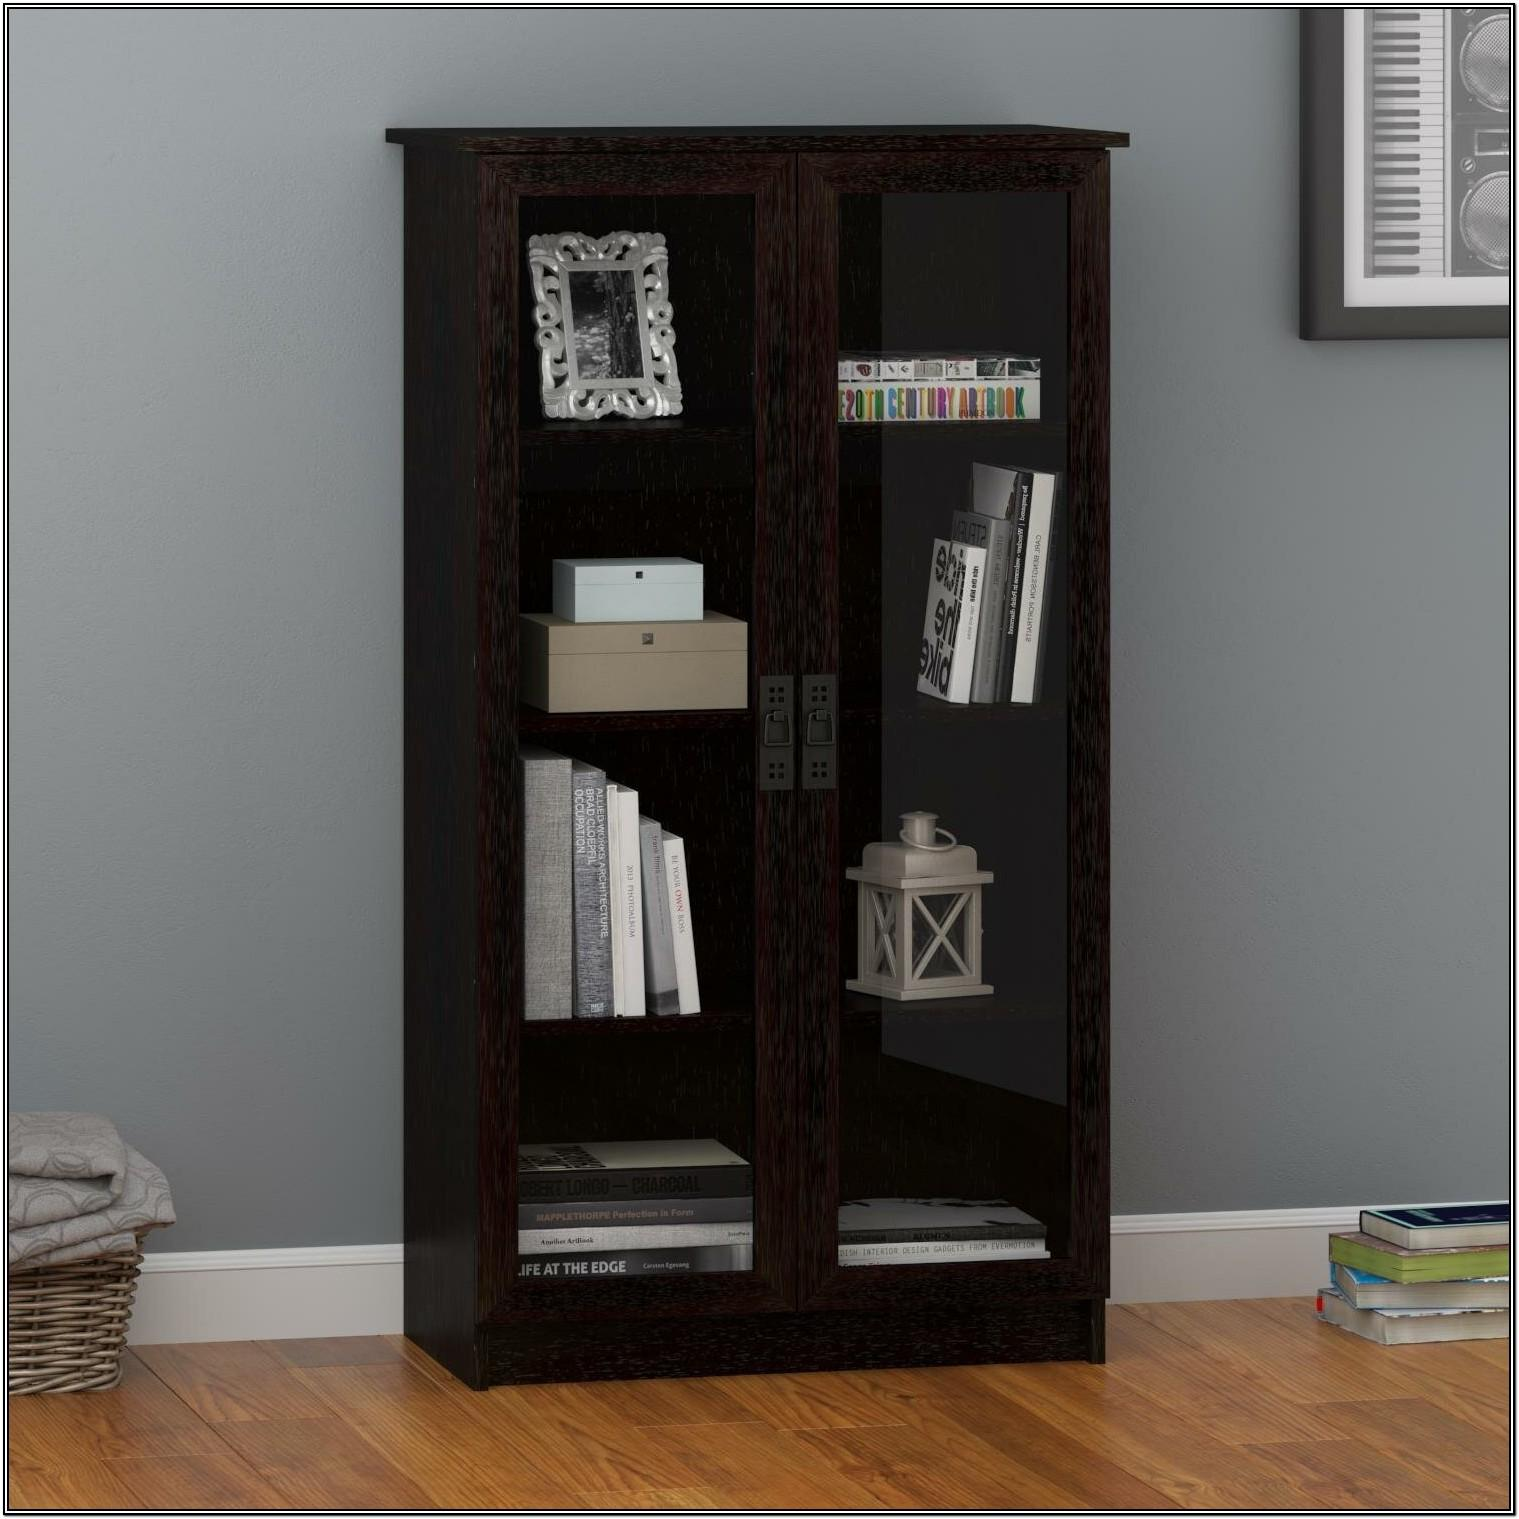 Living Room Bookshelf With Glass Doors